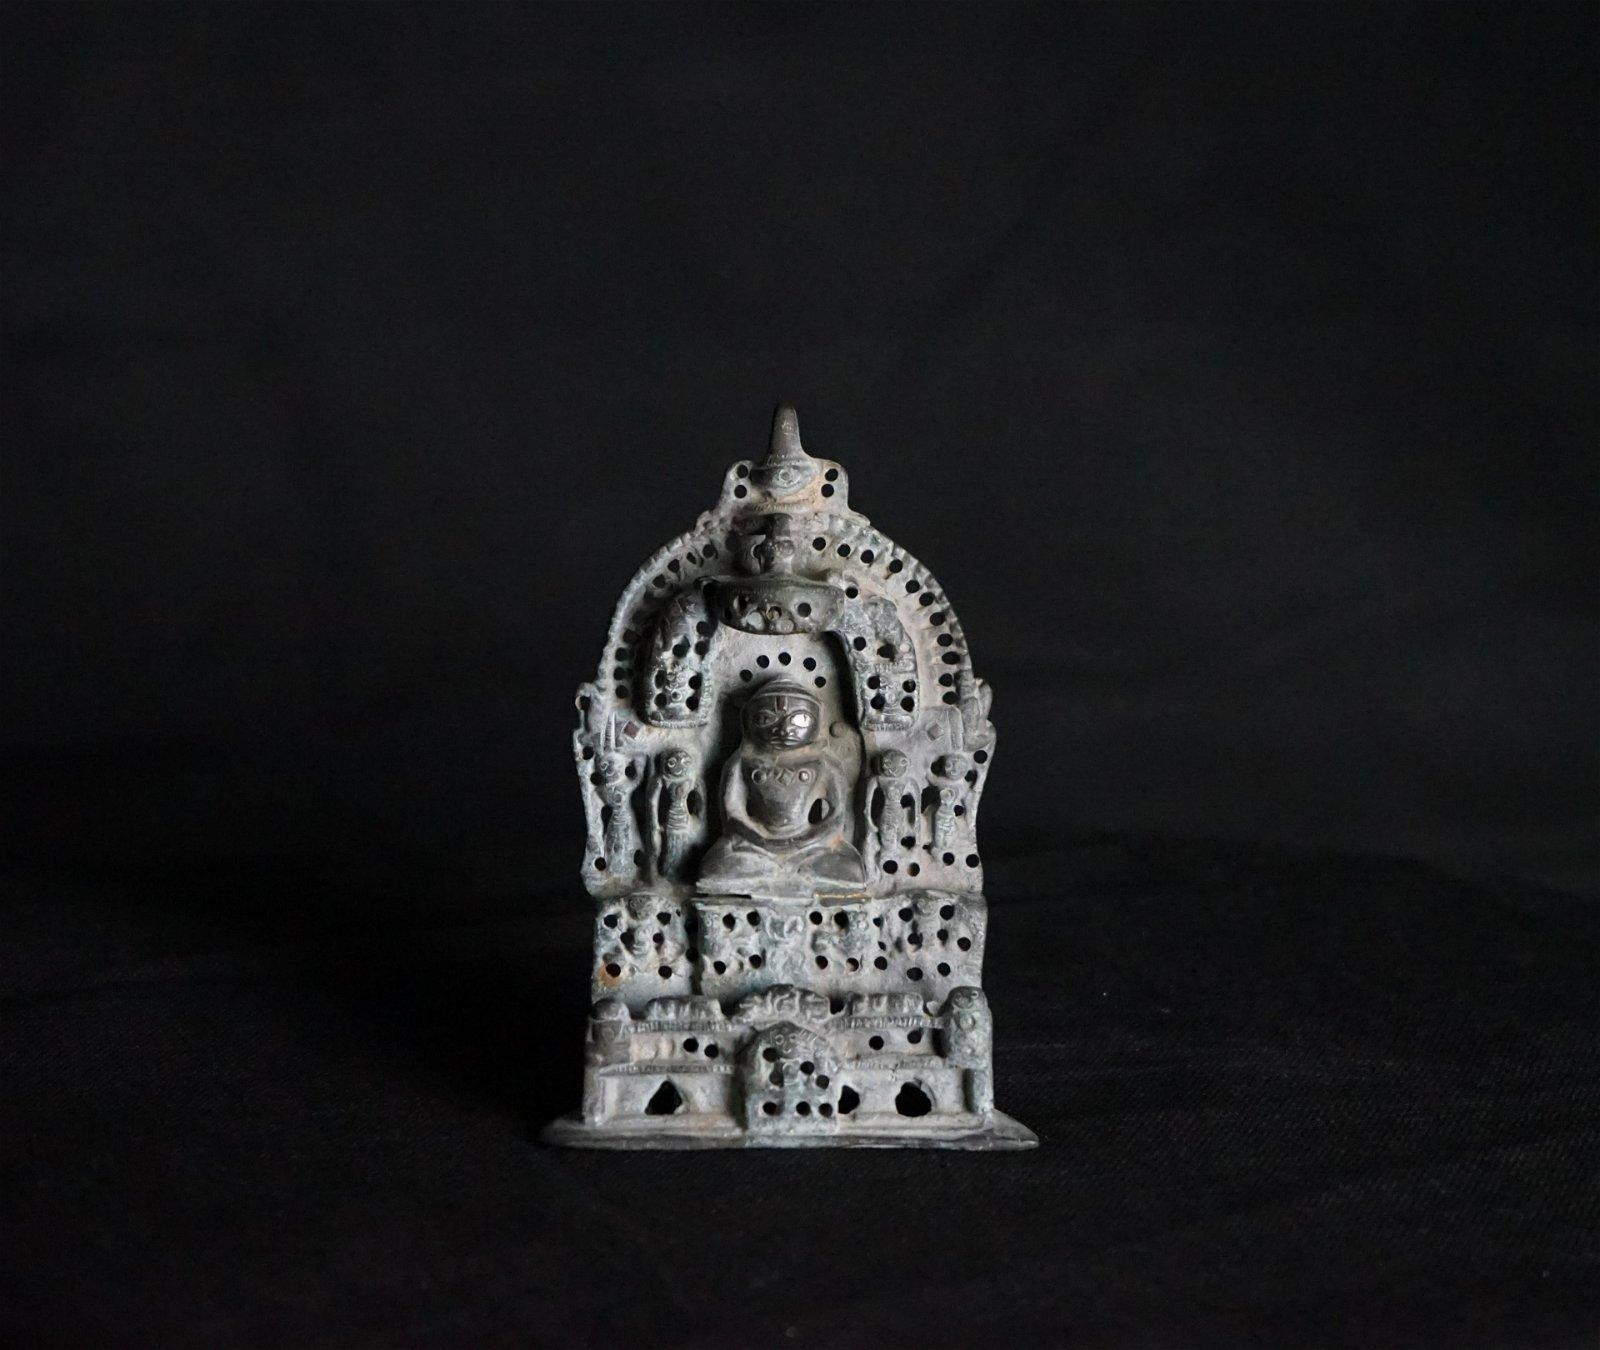 A Nice Old Bronze Jain Hindu / Buddhist Figure